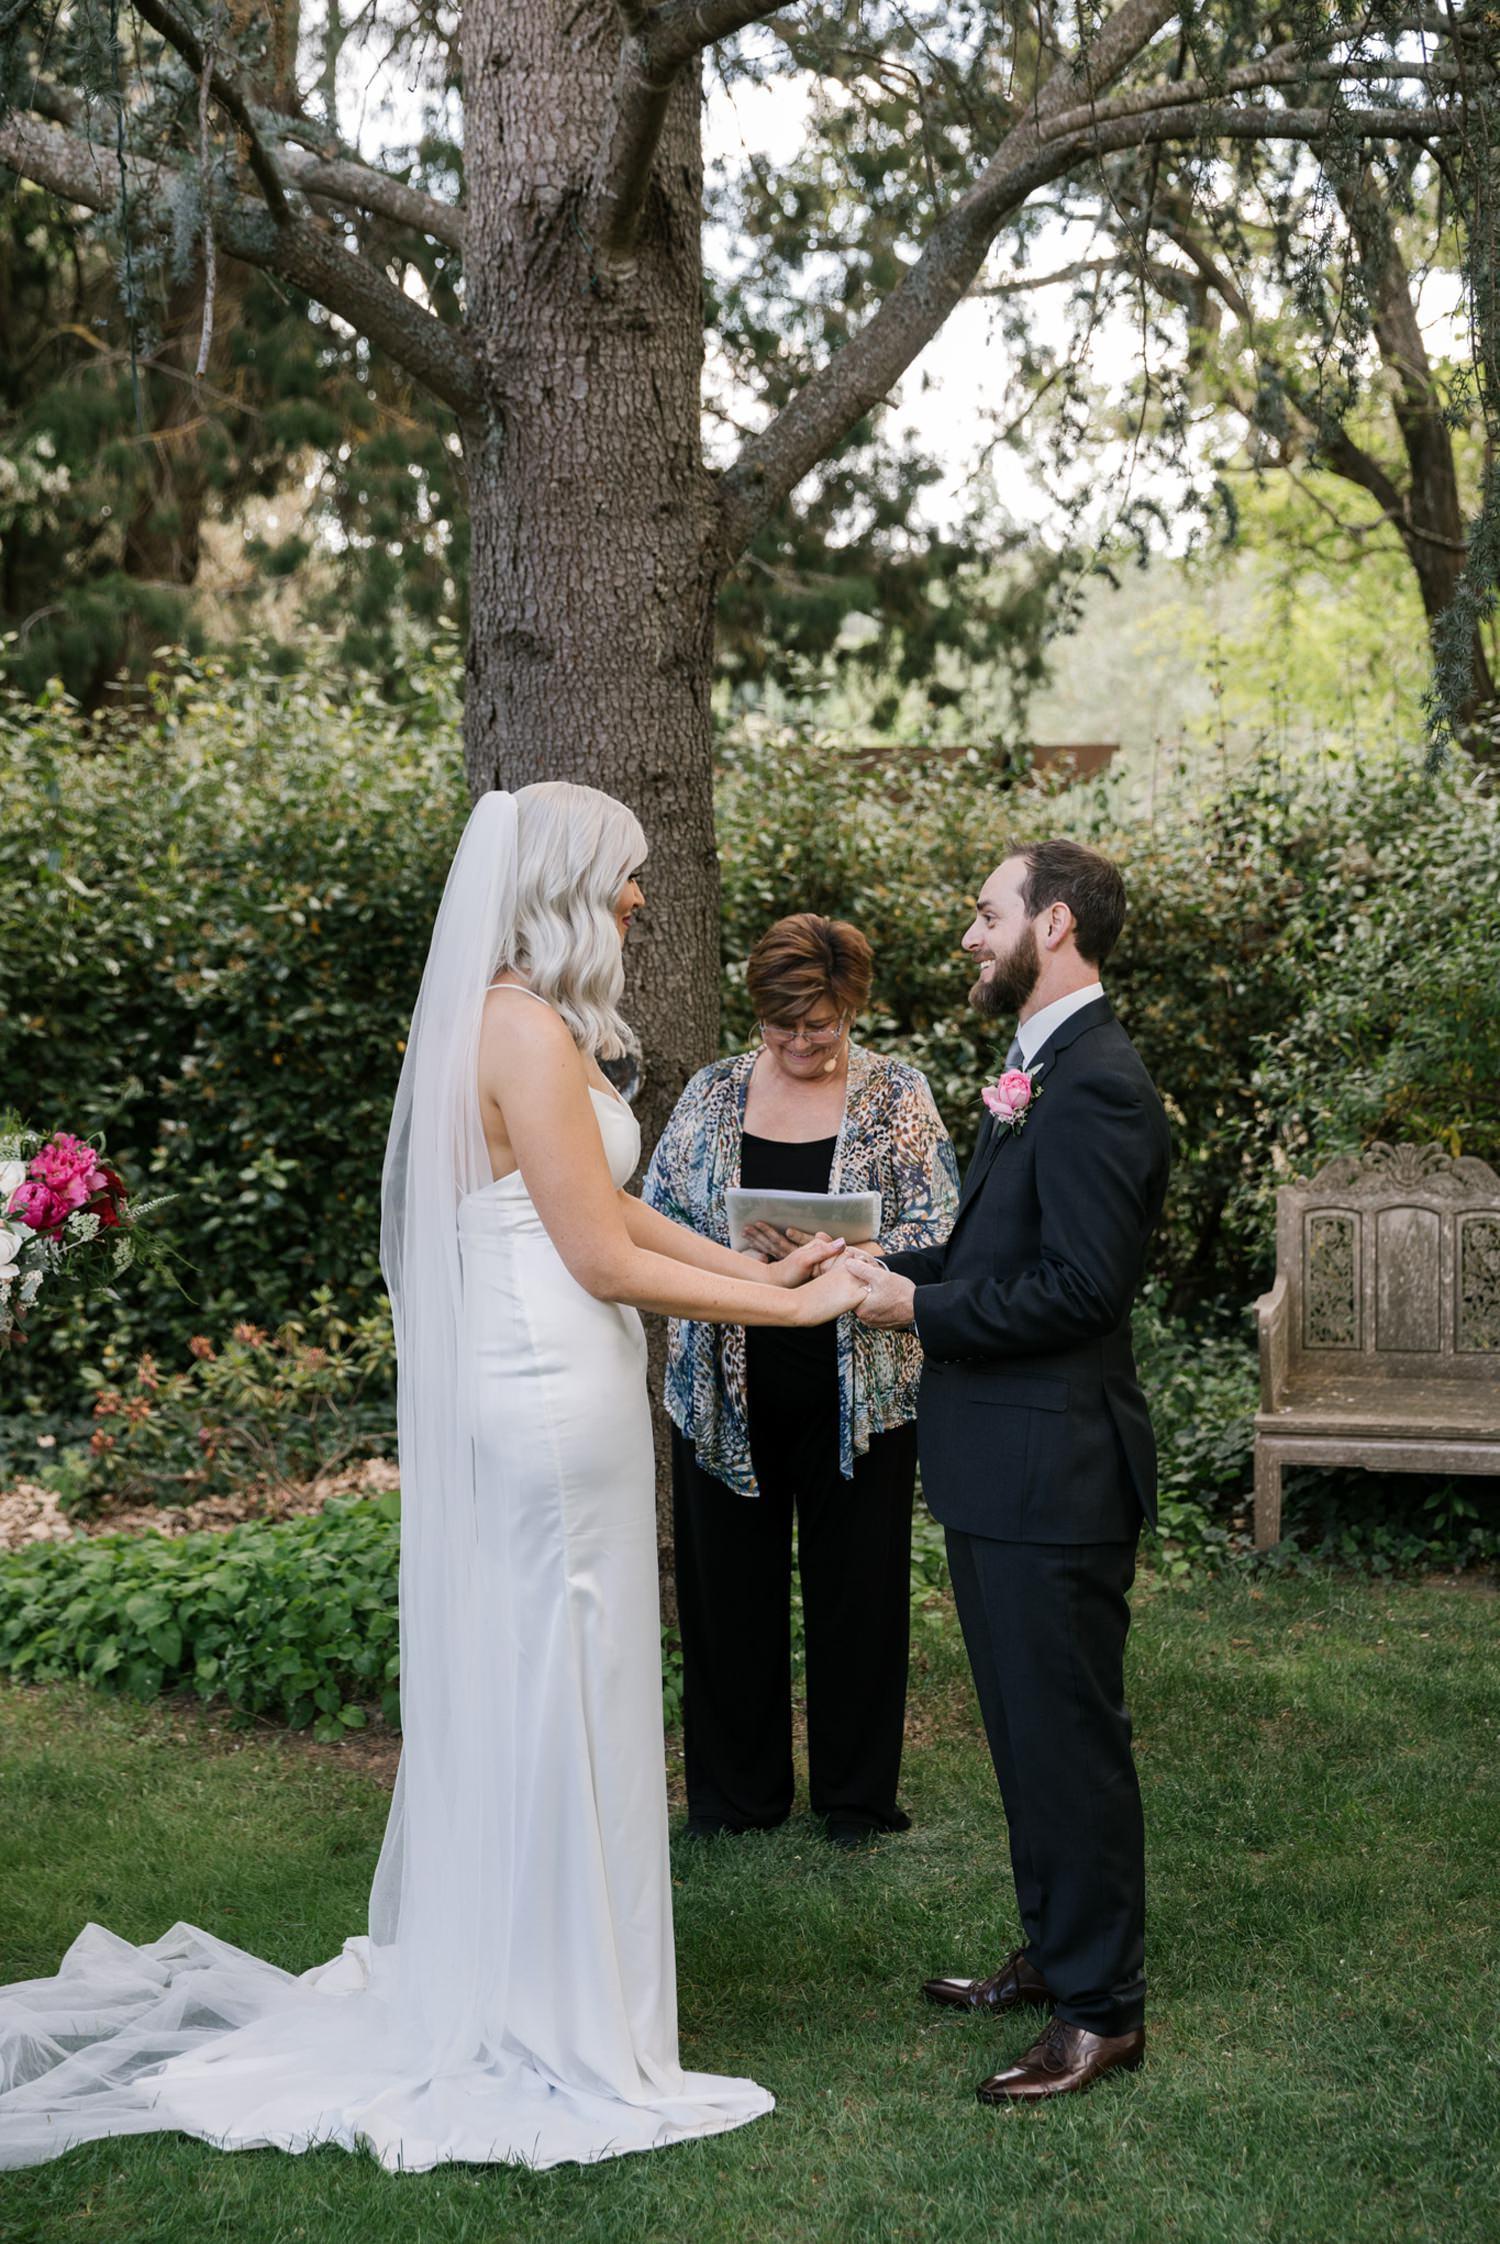 brea luke erin latimore photography athol gardens wedding blayney 9.jpg